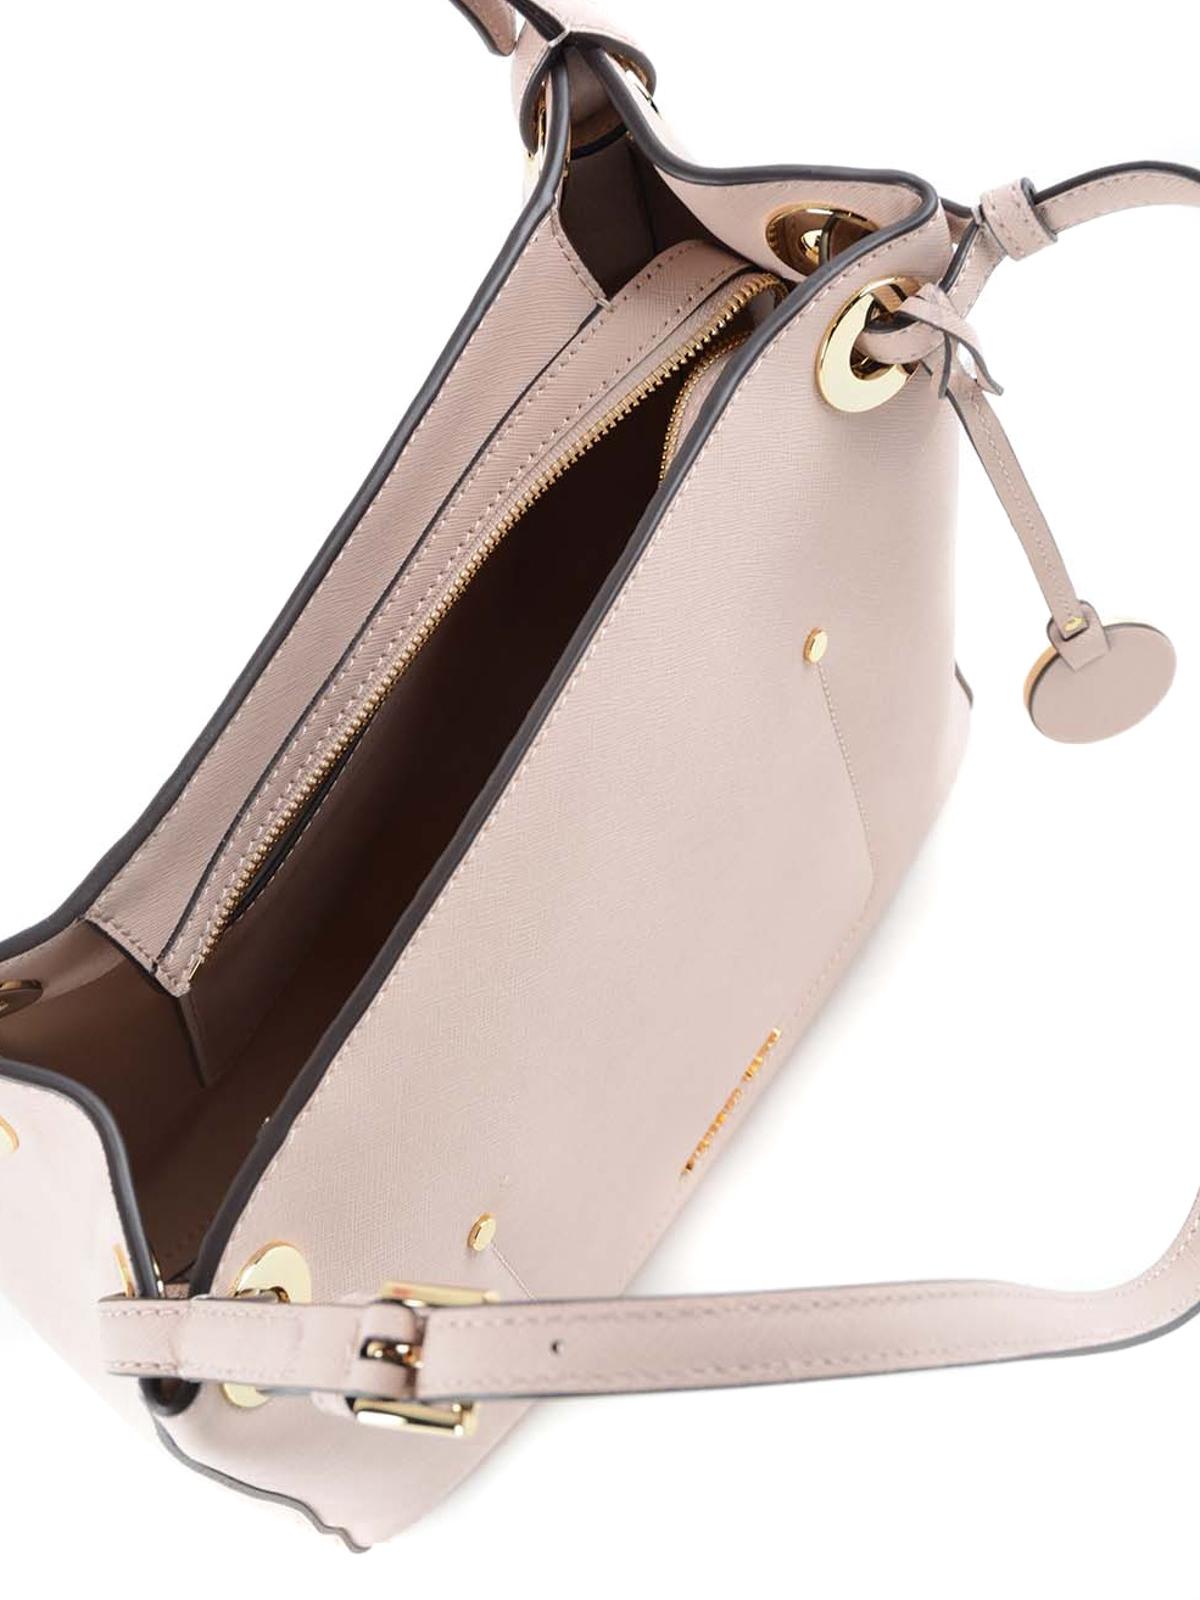 277dbd87158d MICHAEL KORS buy online Walsh medium shoulder tote. MICHAEL KORS  totes bags  ...